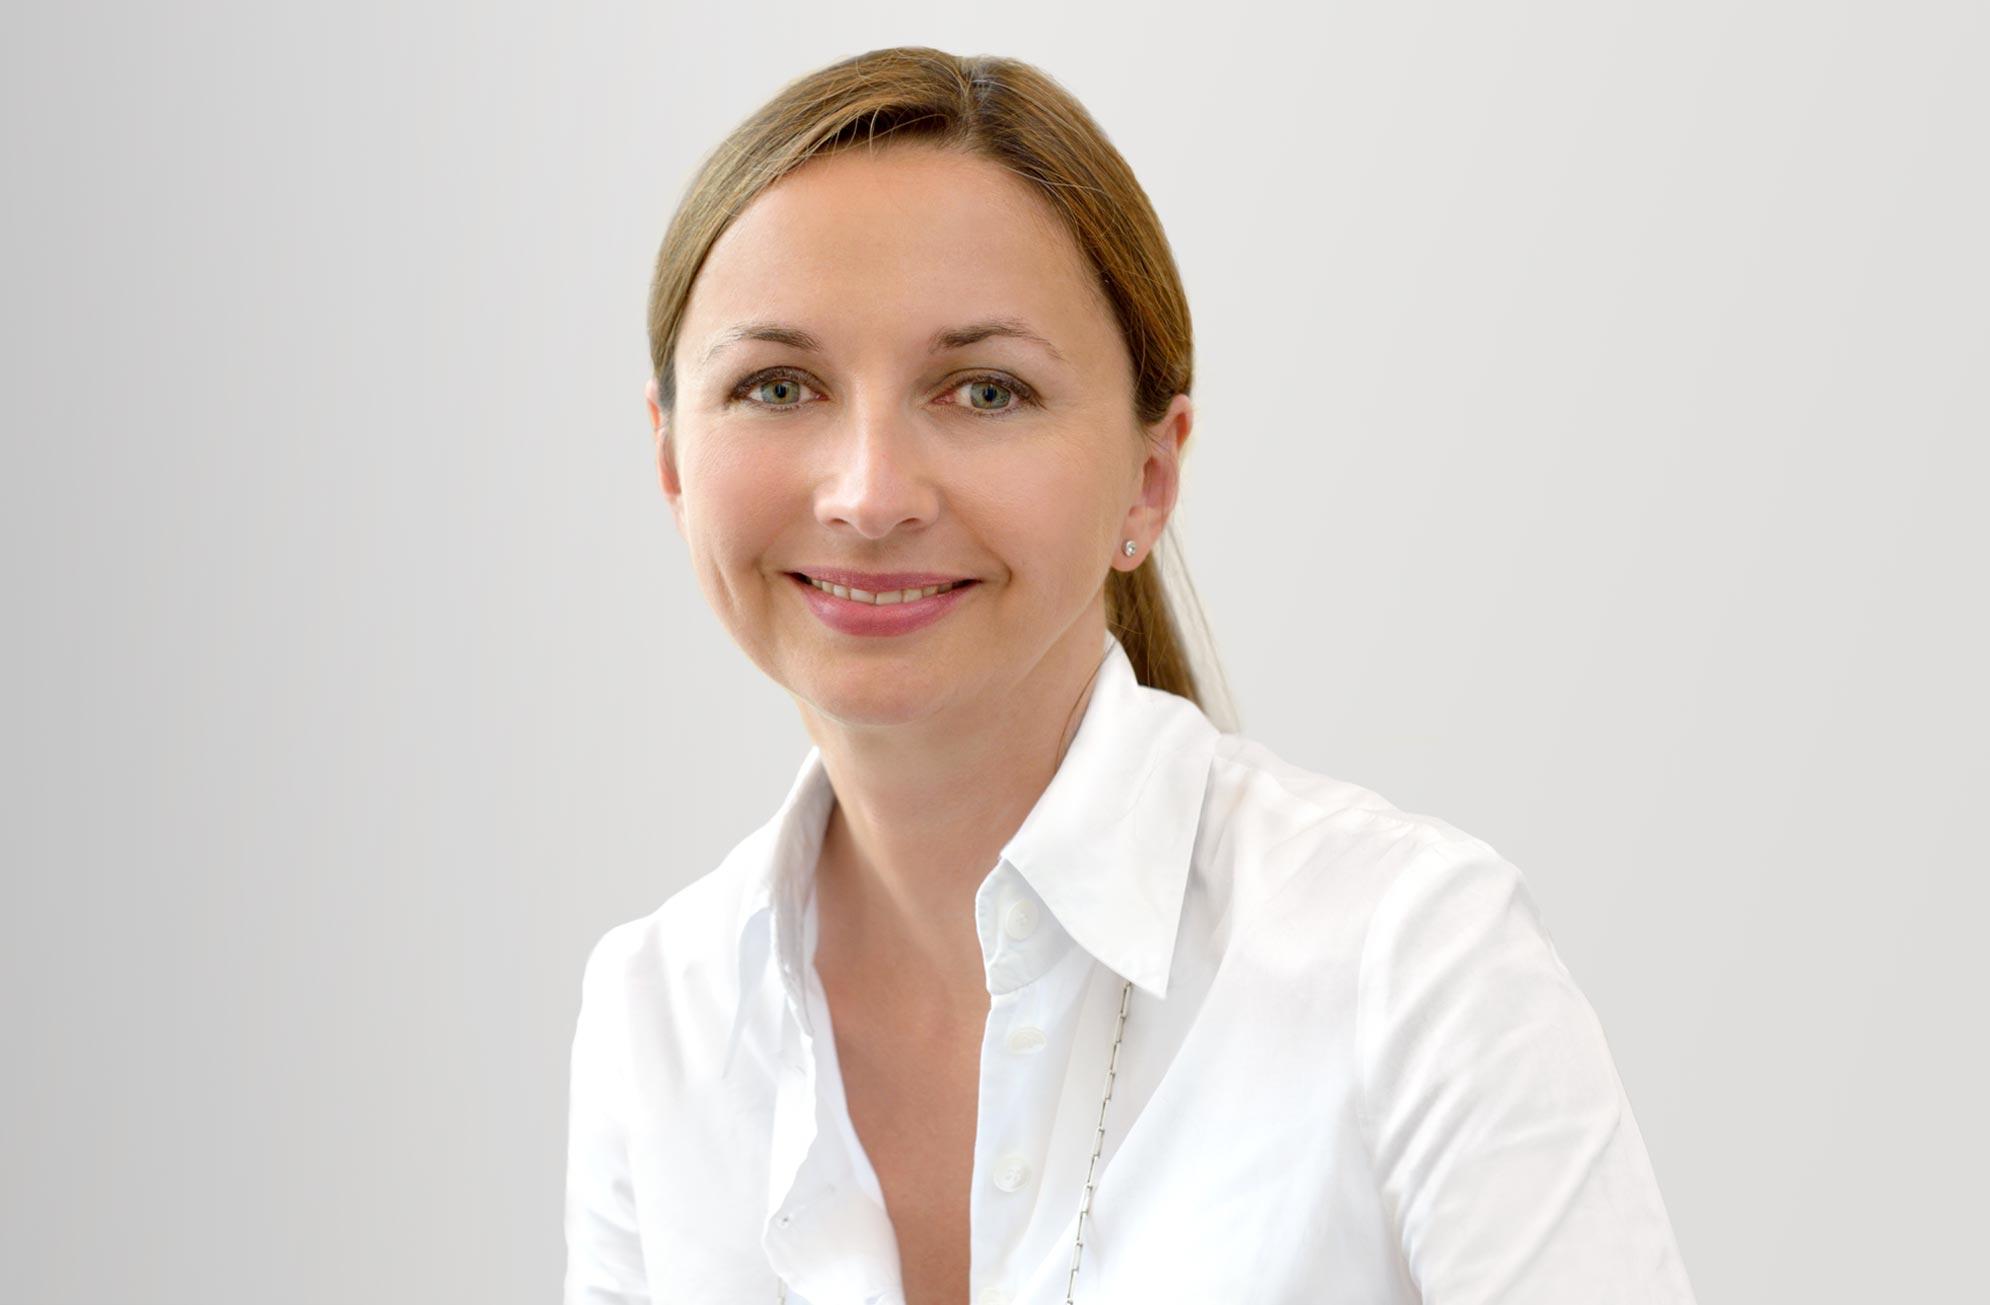 Gynaecologist Munich Dr. med. Gabriele Anker mph